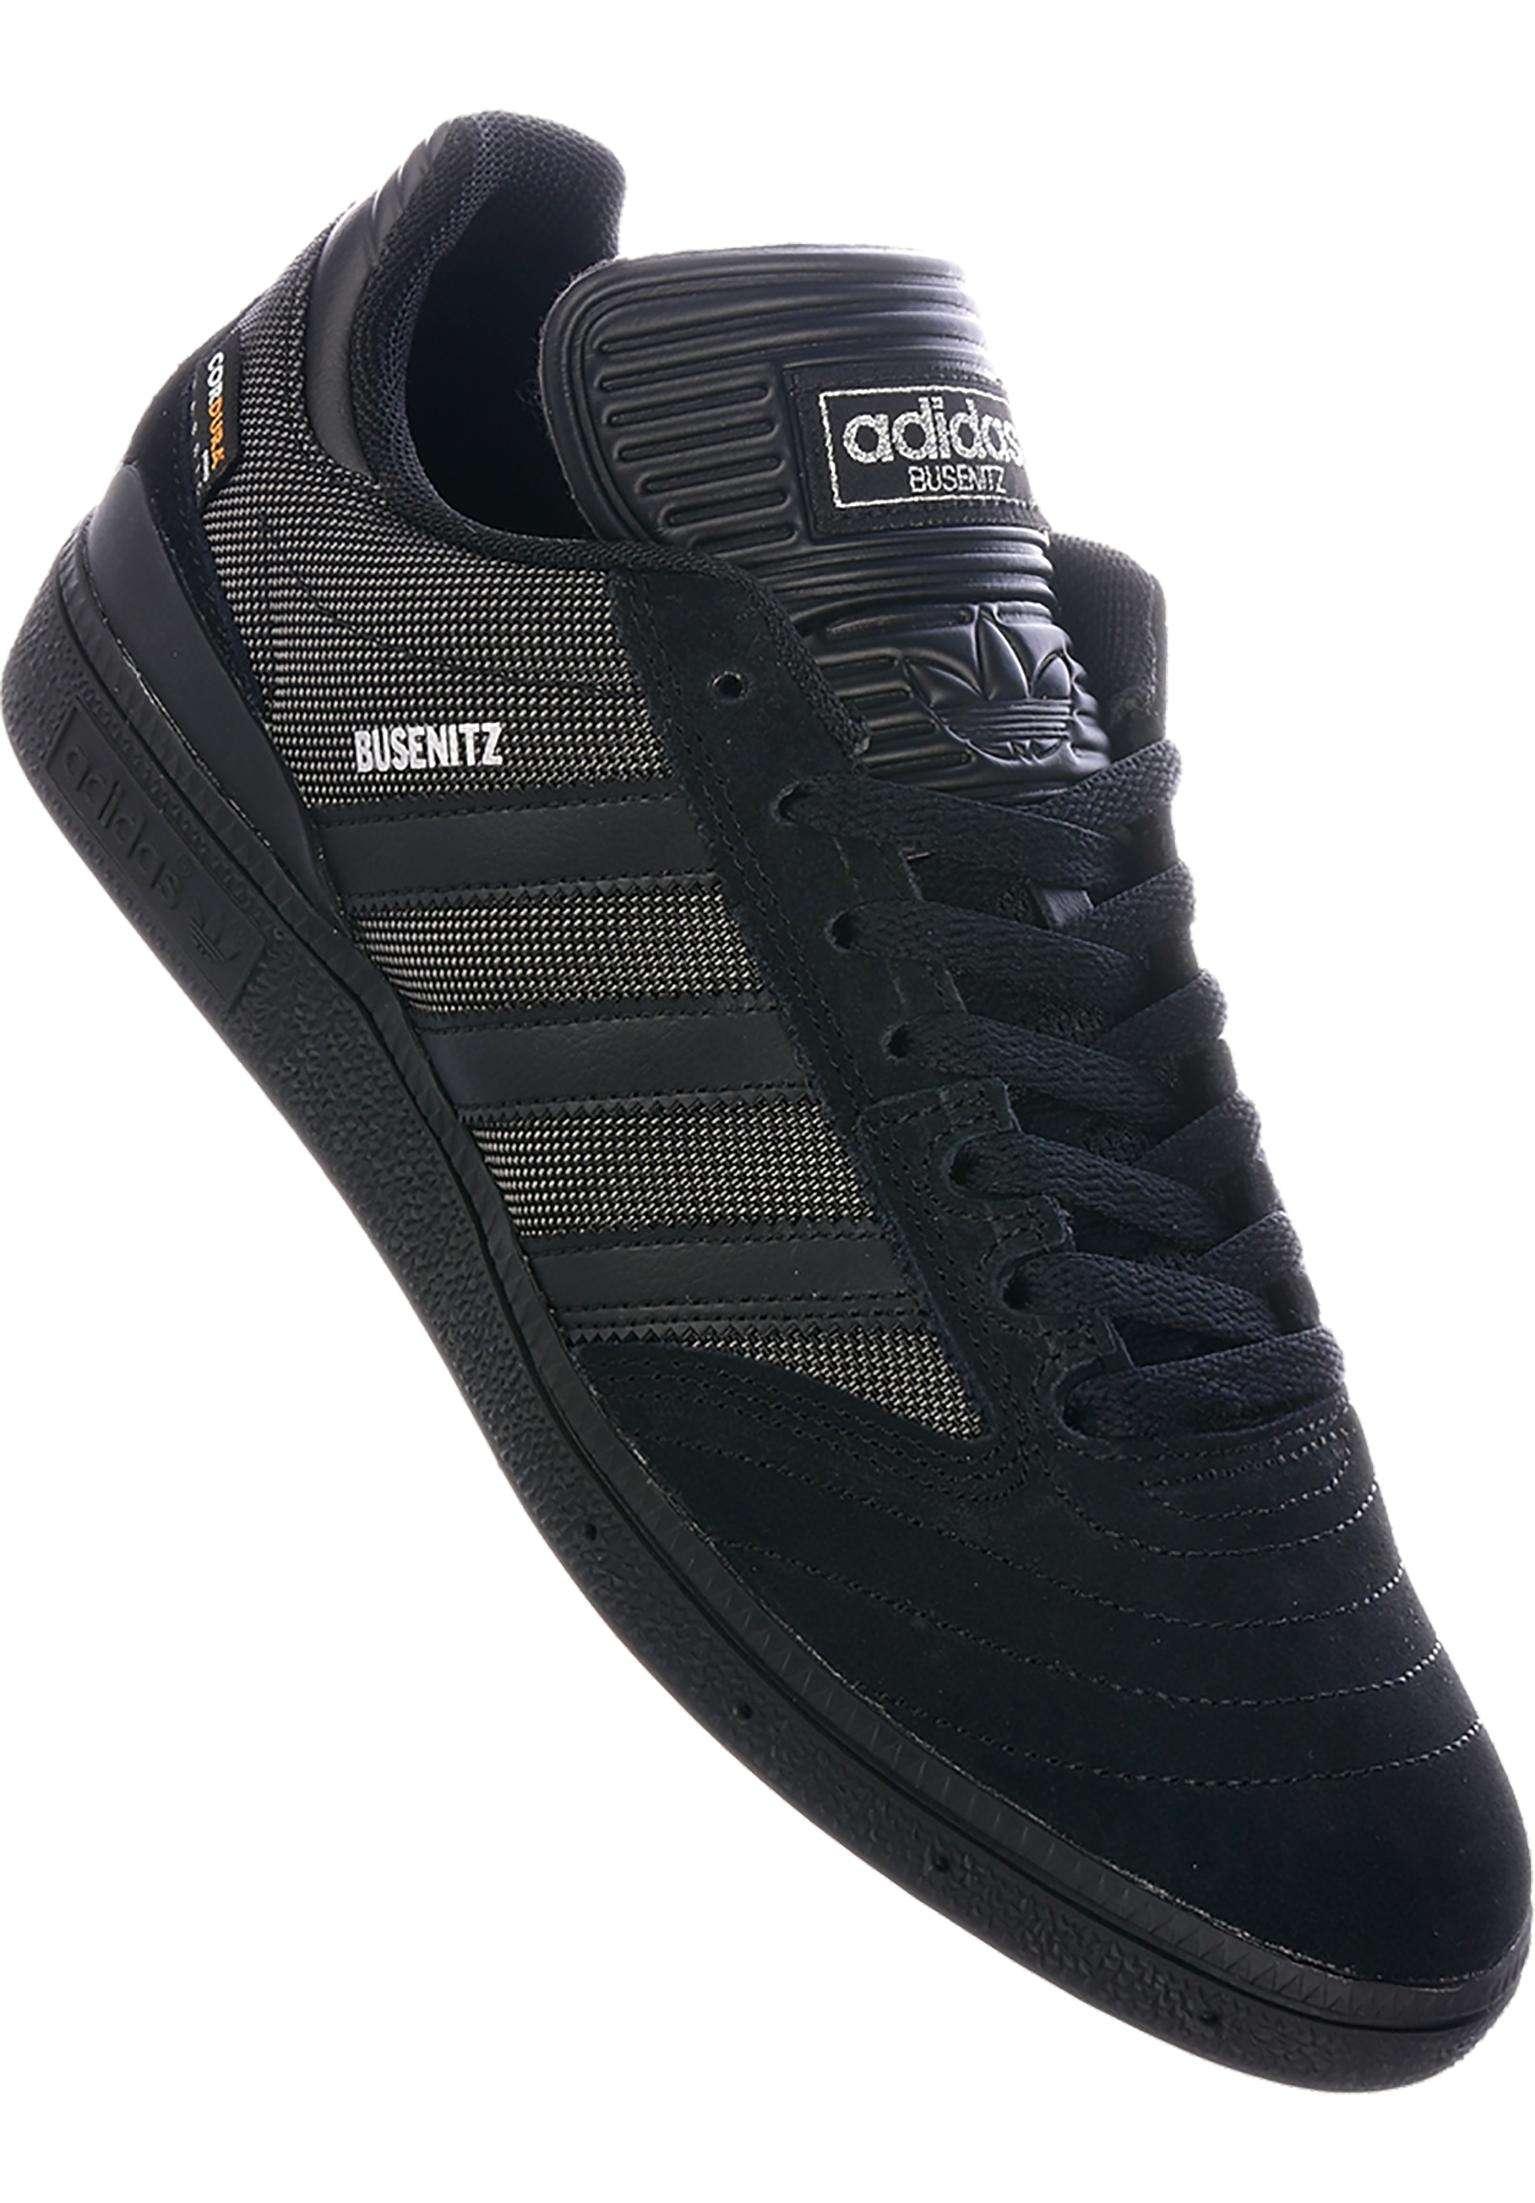 0f6bb63e12a4 Busenitz Pro adidas-skateboarding All Shoes in  coreblack-coreblack-coreblack for Men   Titus